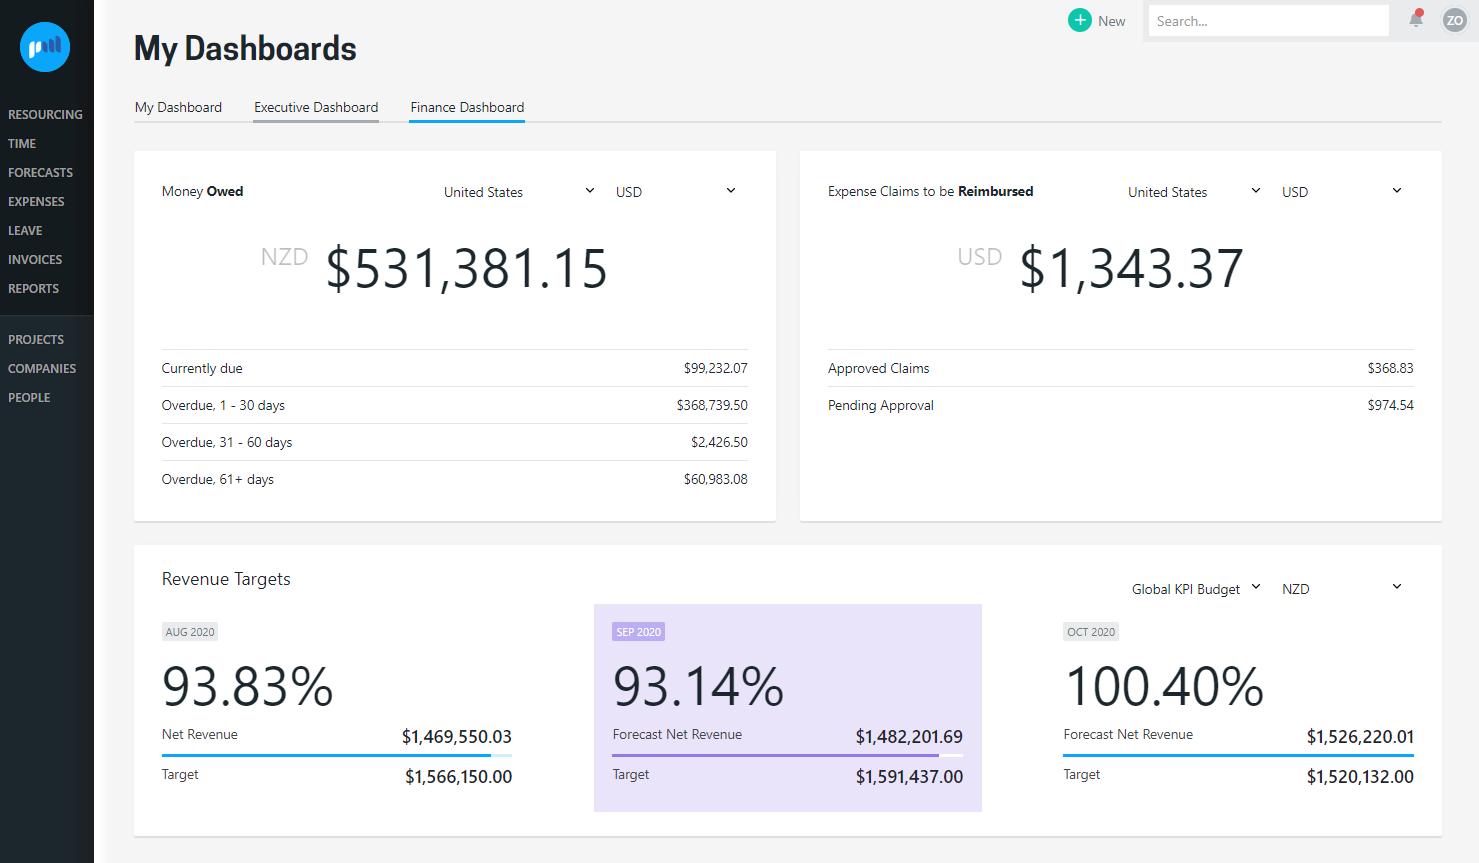 Finance dashboiard includes expenses to be reimbursed widget